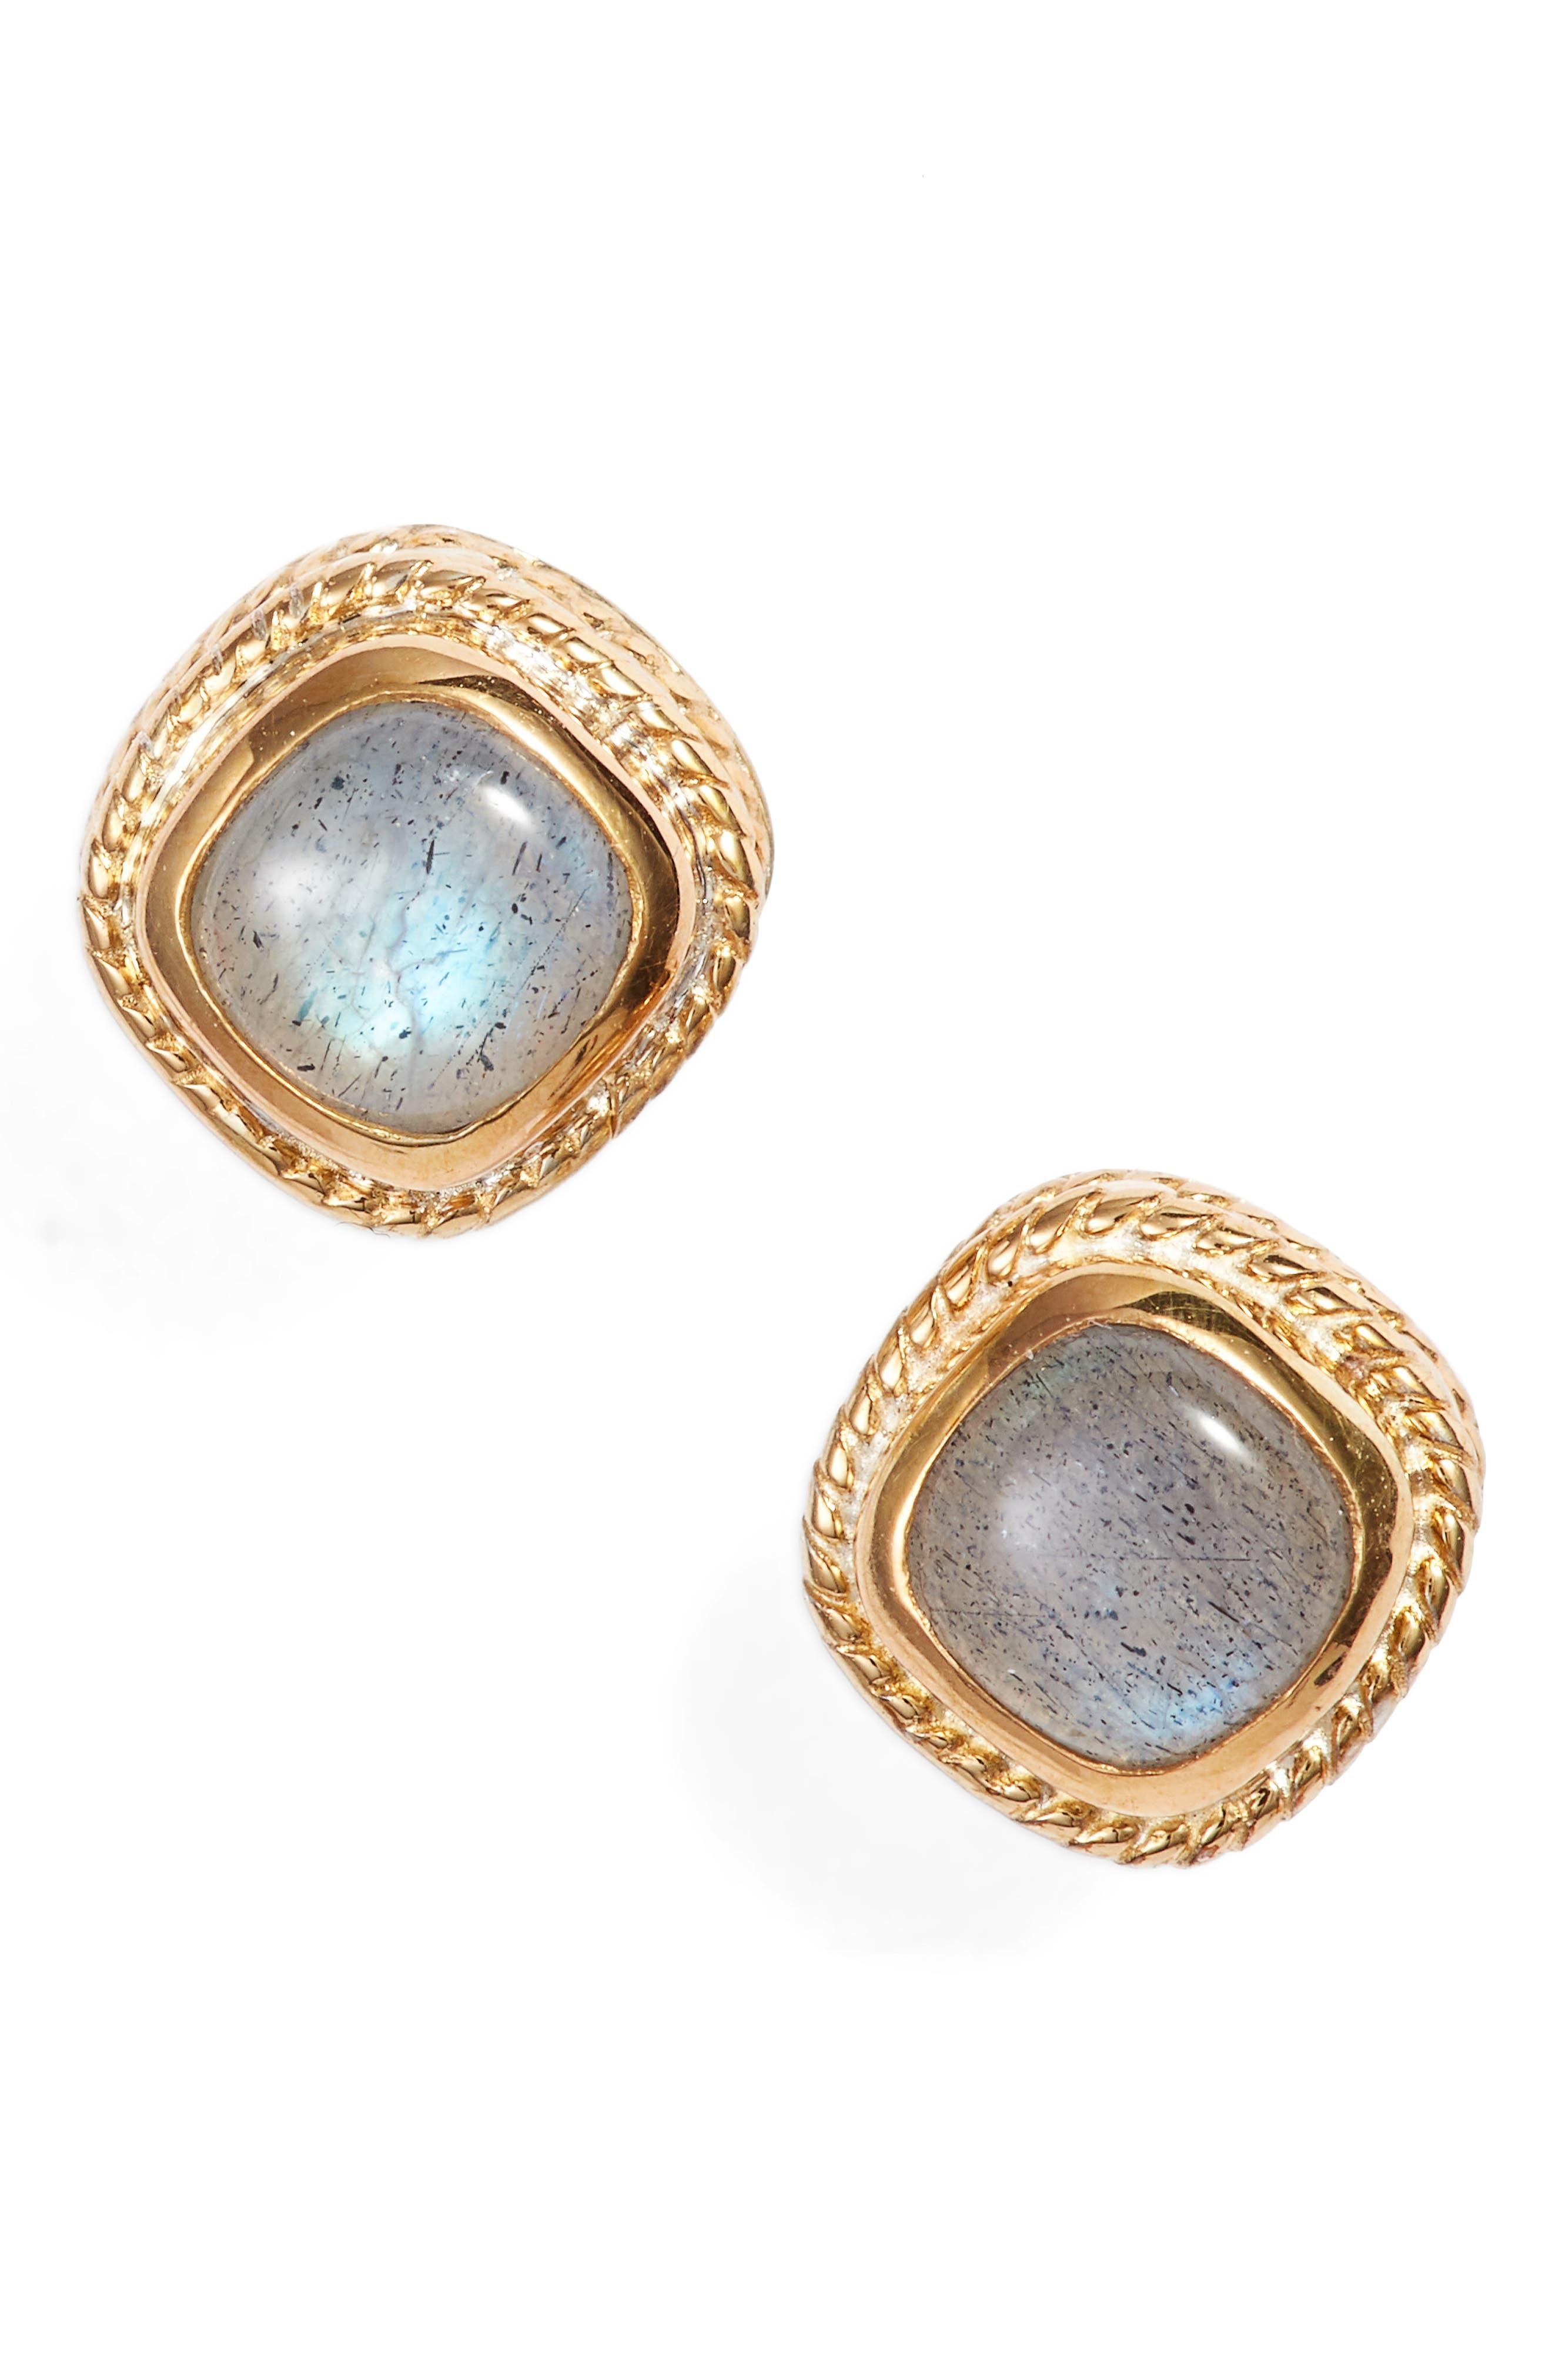 Semiprecious Stone Cushion Stud Earrings,                             Main thumbnail 1, color,                             GOLD/ LABRADORITE